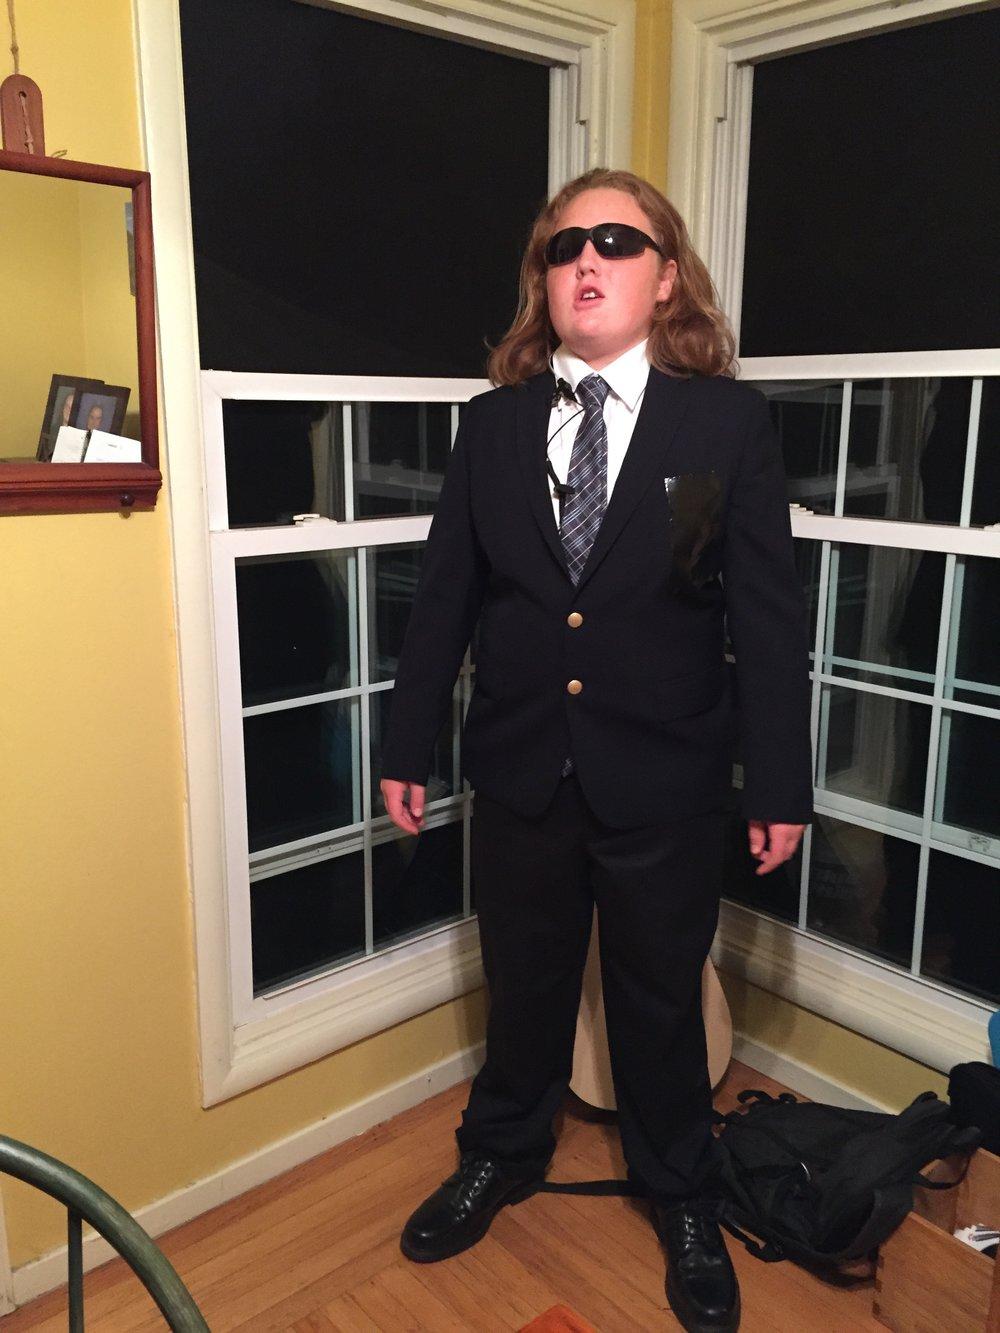 Secret Service Agent, and...